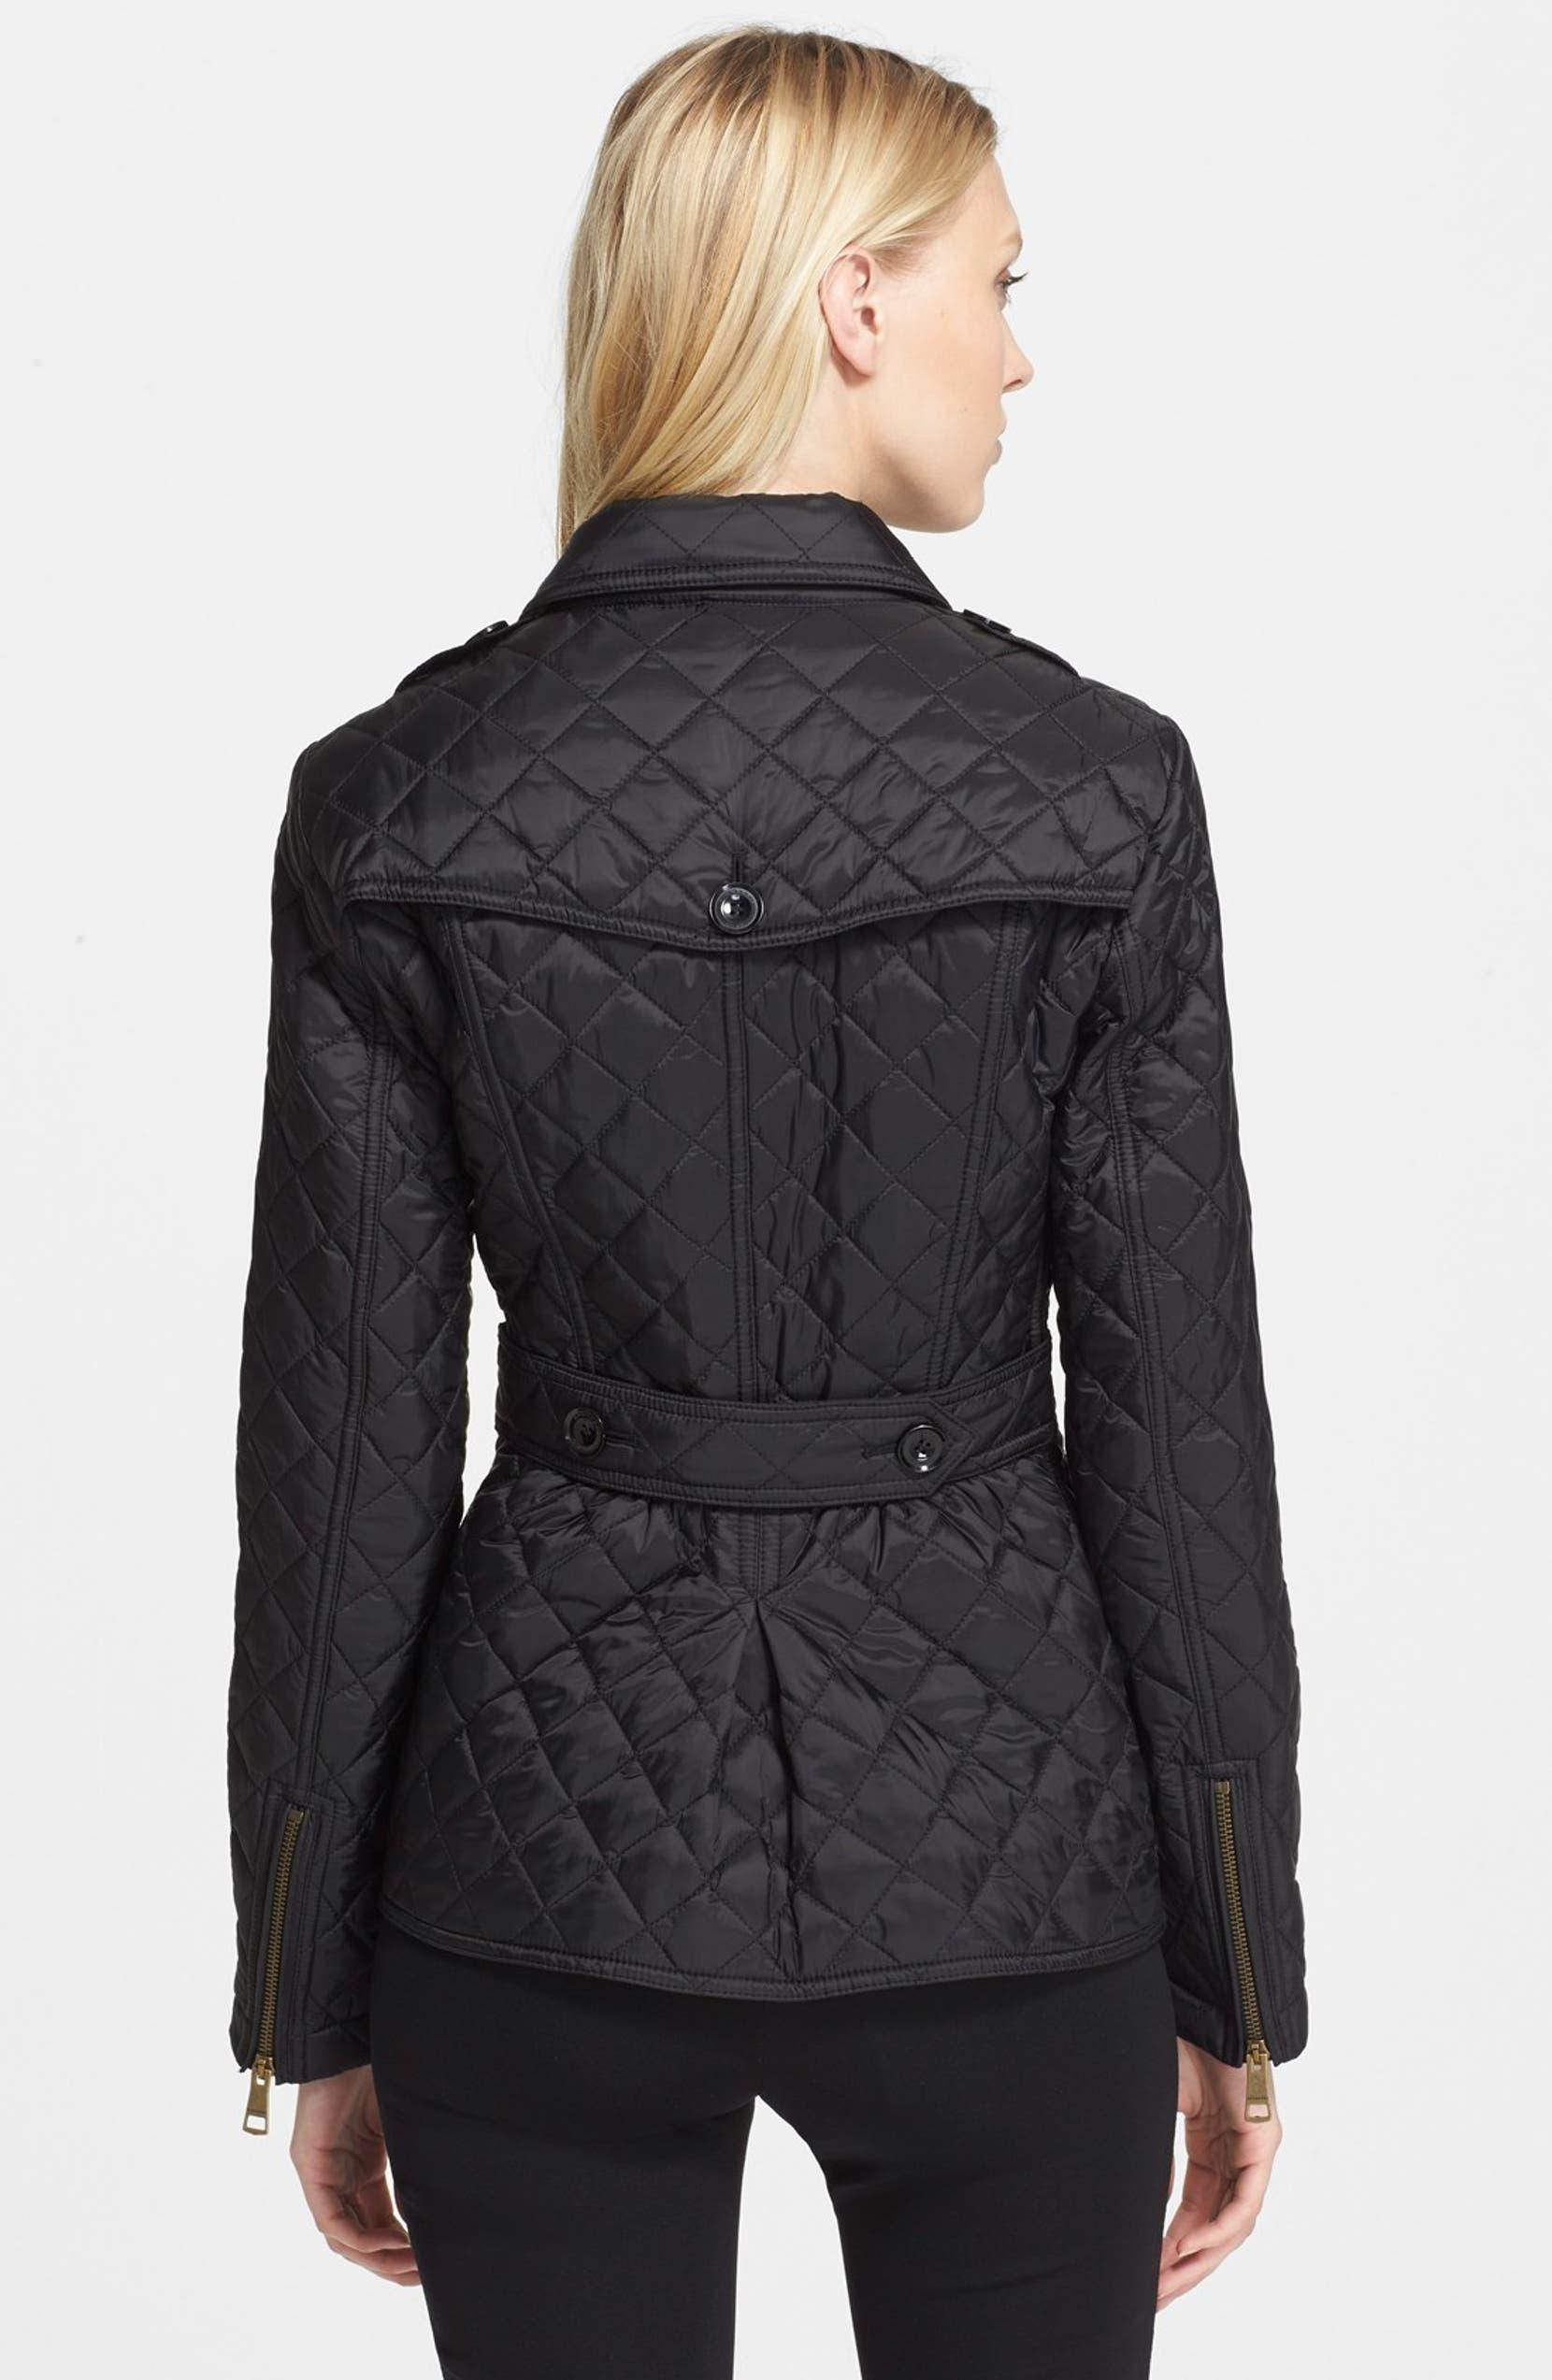 Marriford Diamond Quilt Jacket